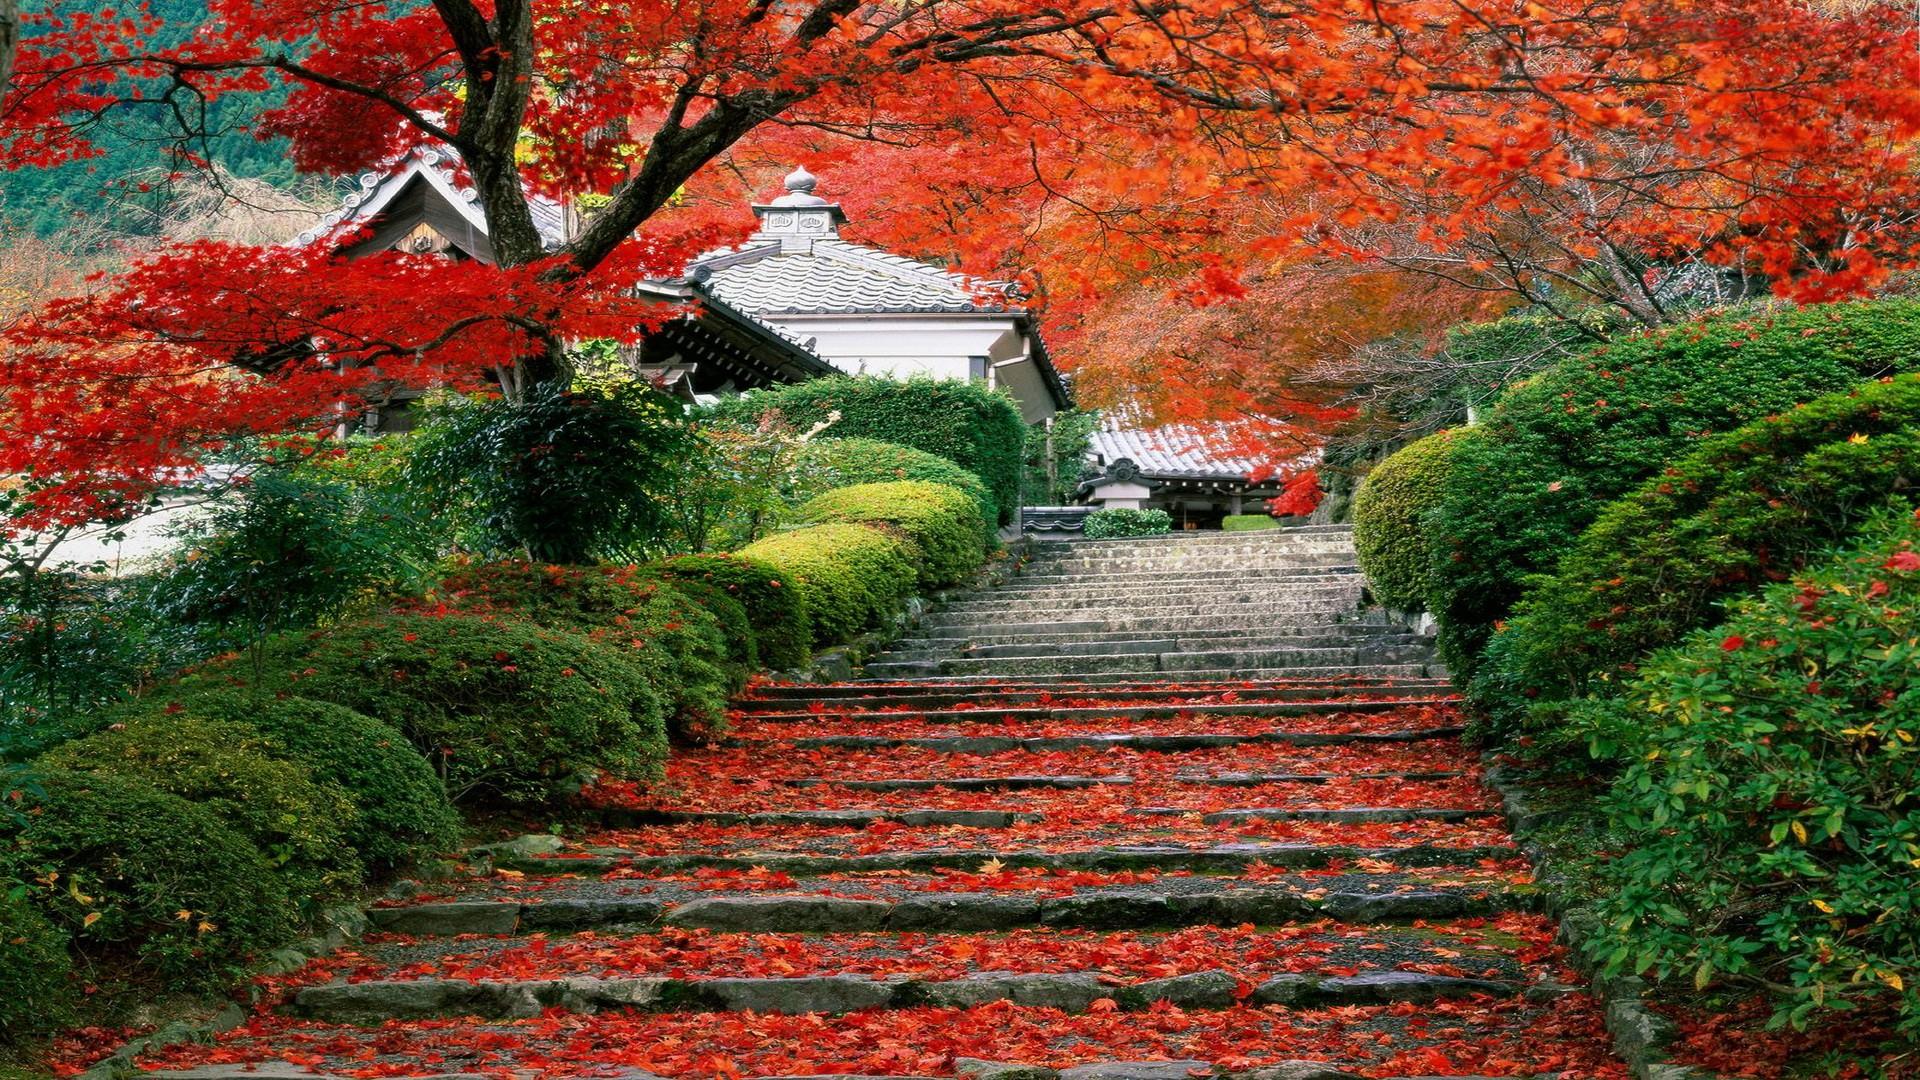 Japan Landscapes Wallpaper 1920x1080 Japan Landscapes Garden Kyoto 1920x1080